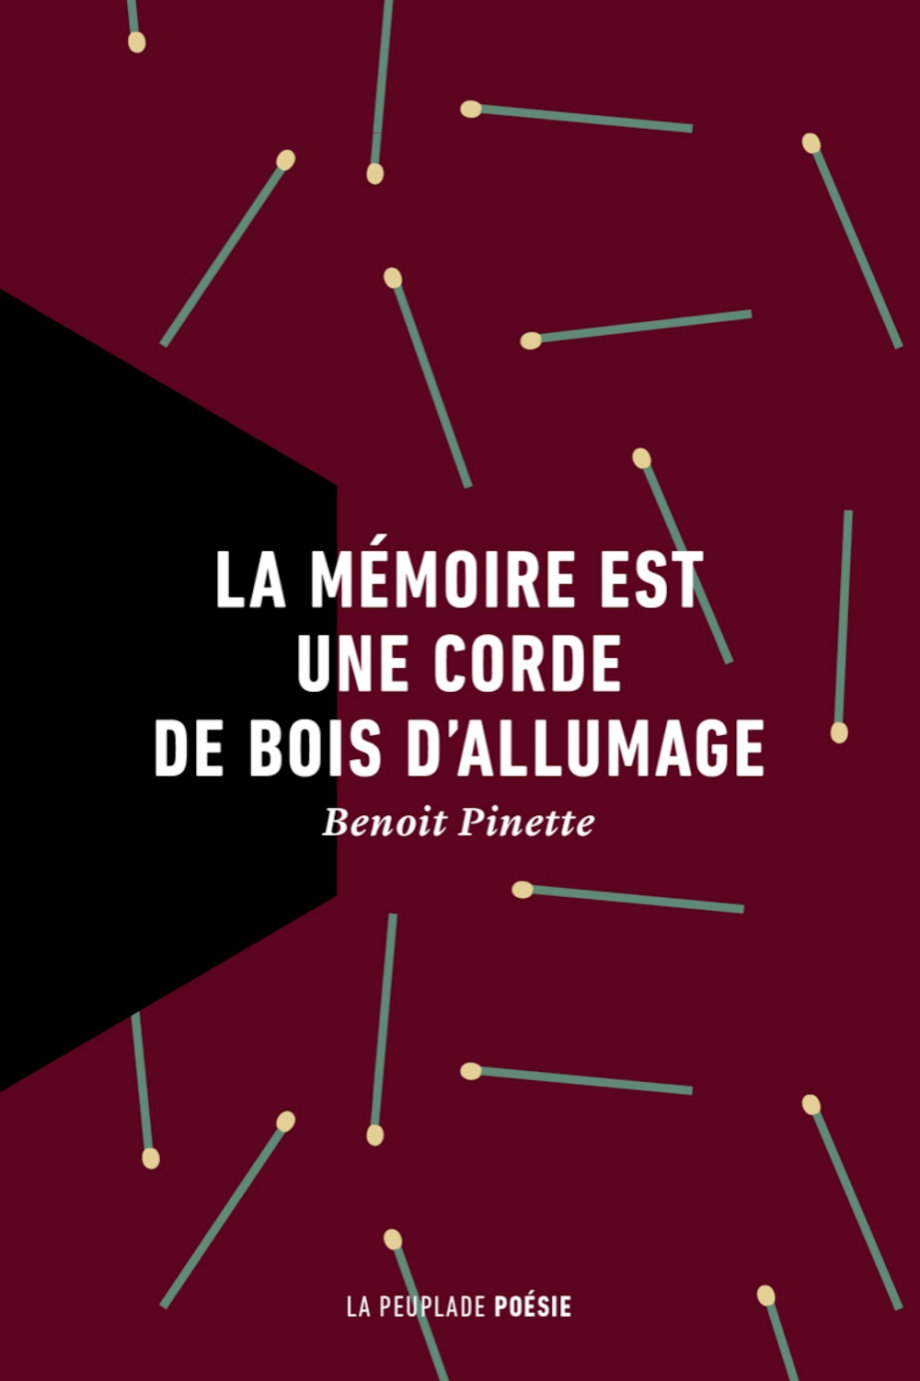 Benoît Pinette